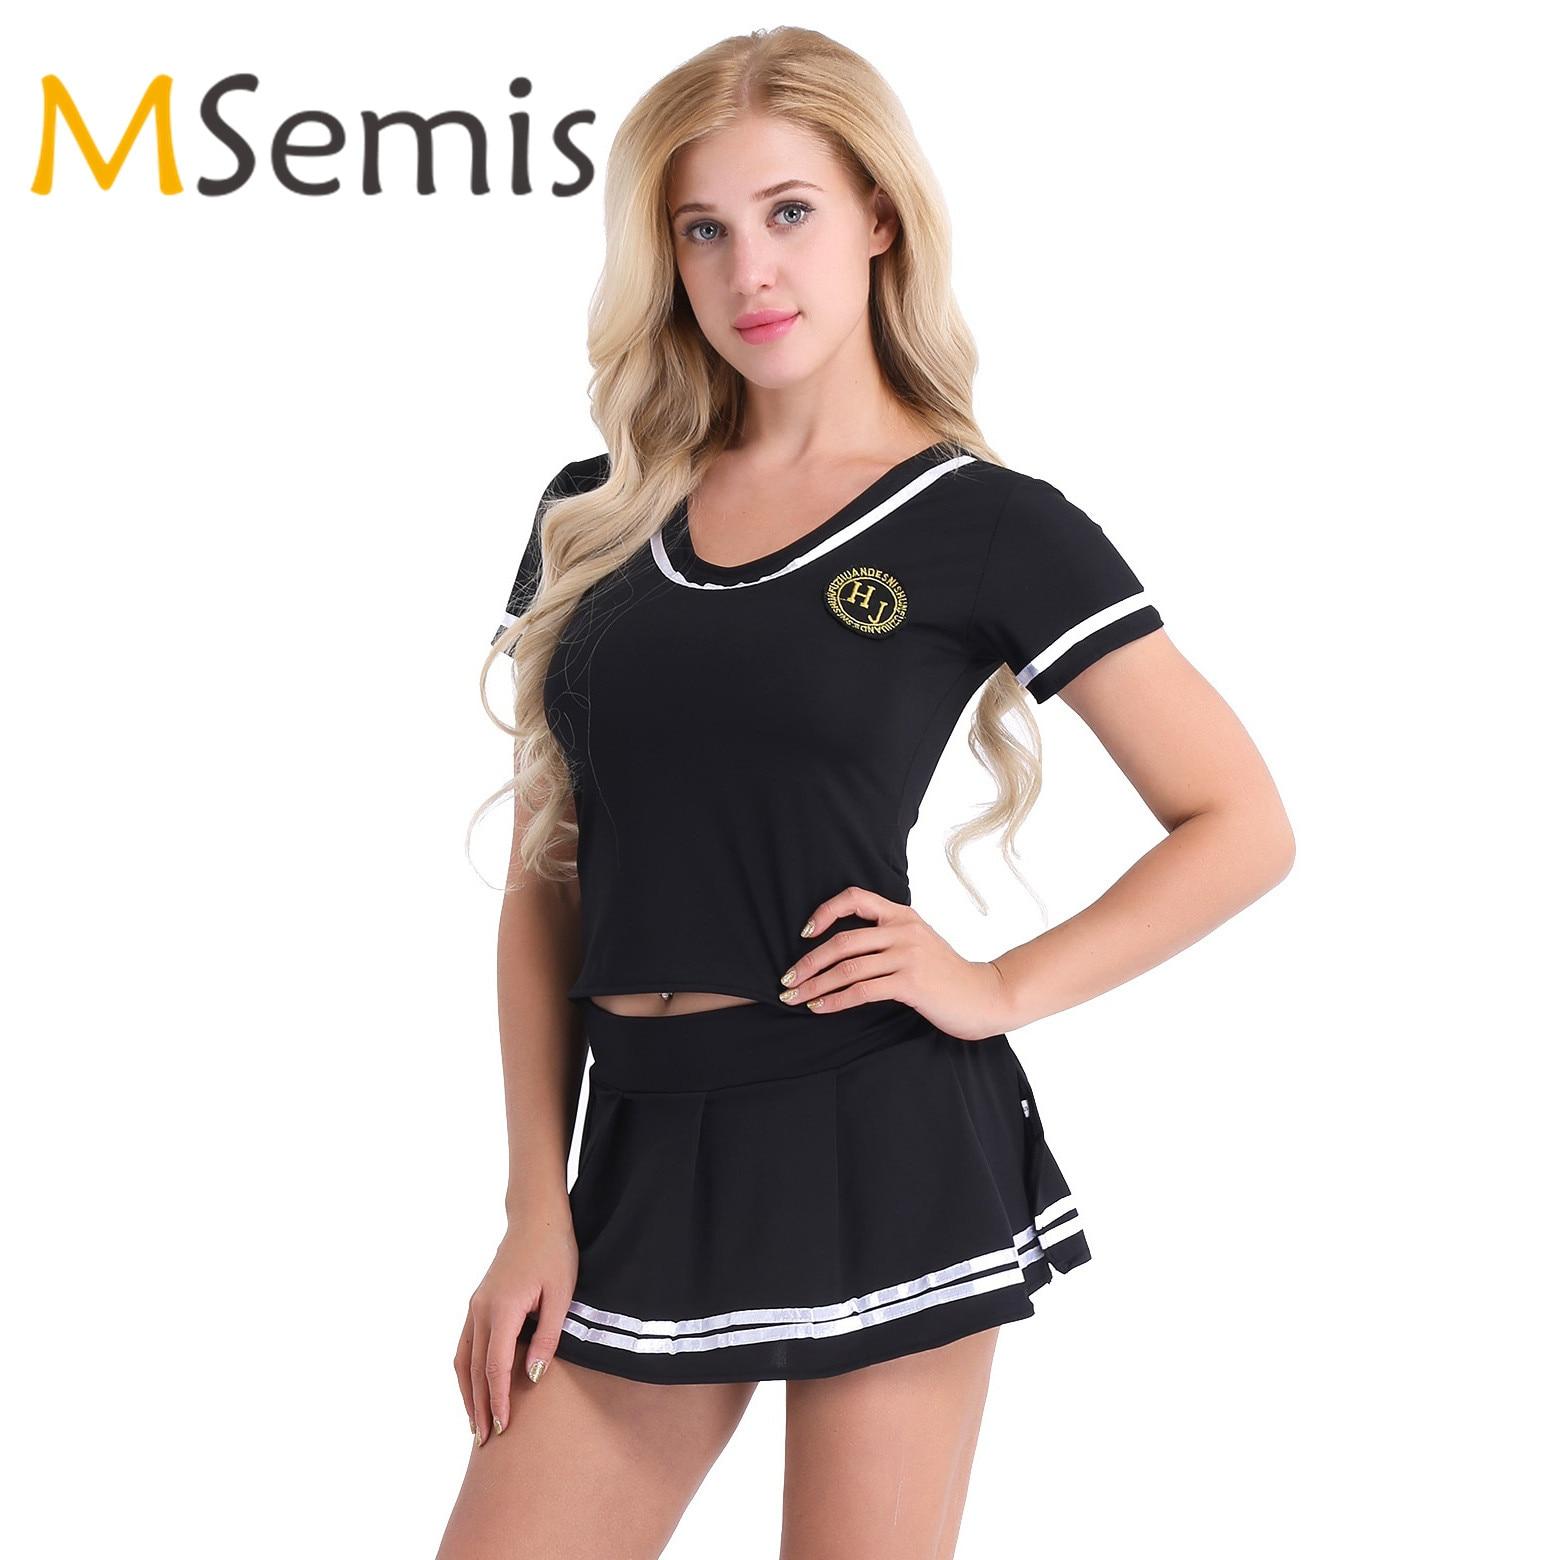 Women Girls Cheerleader Costume Lingerie Cheerleading T-shirt Top With Mini Skirt And G-string Underwear Sailor Sports Costume